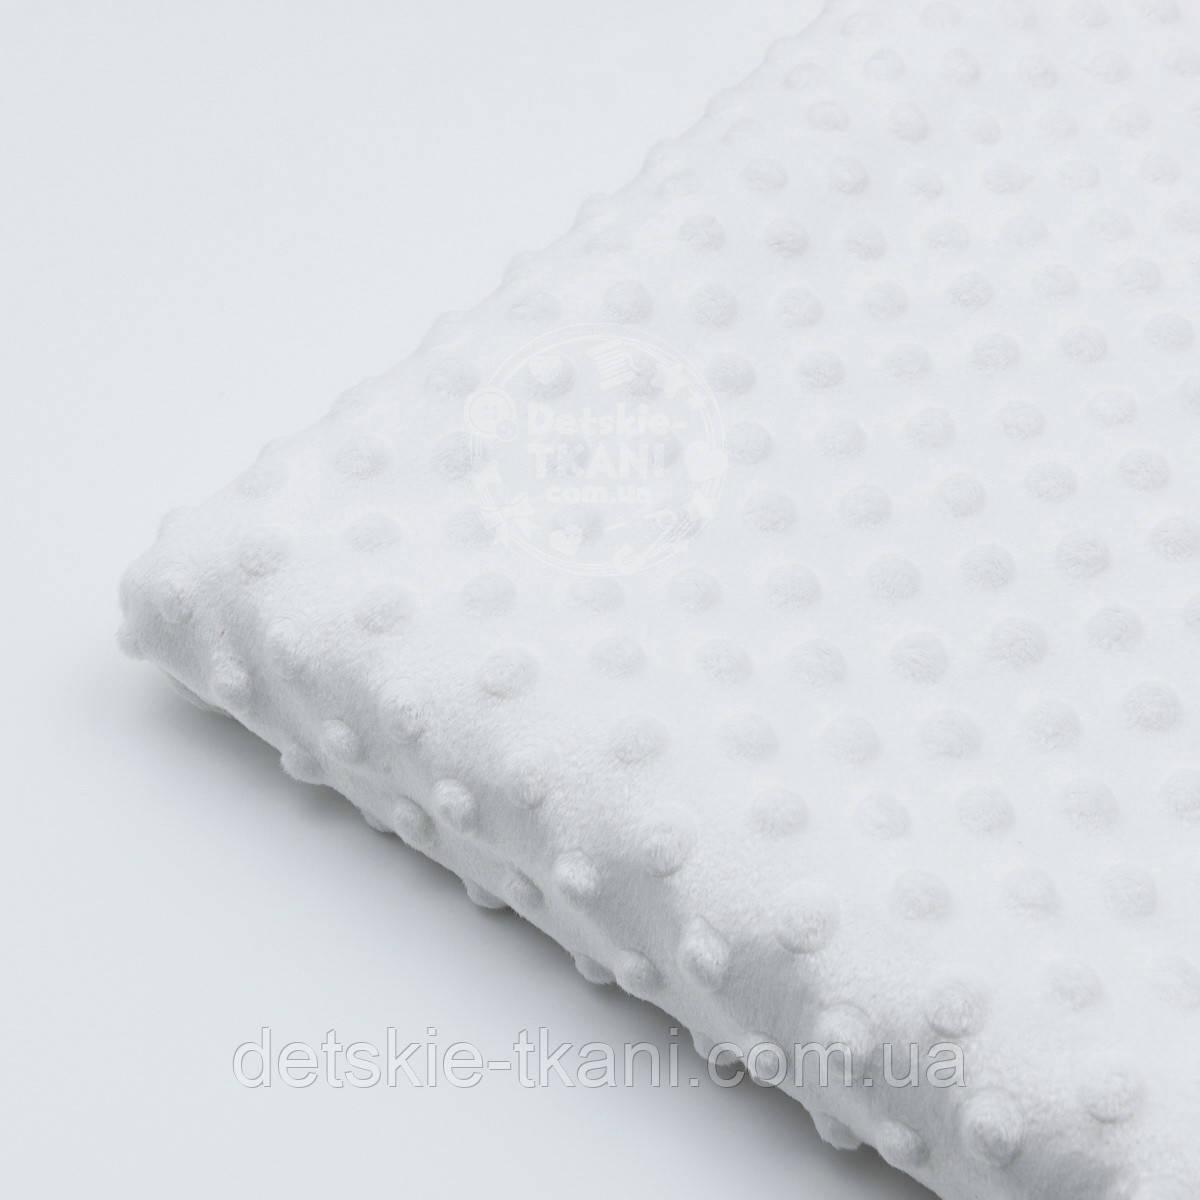 Отрез плюш minky М-10 размером 40*40 см, цвет белый